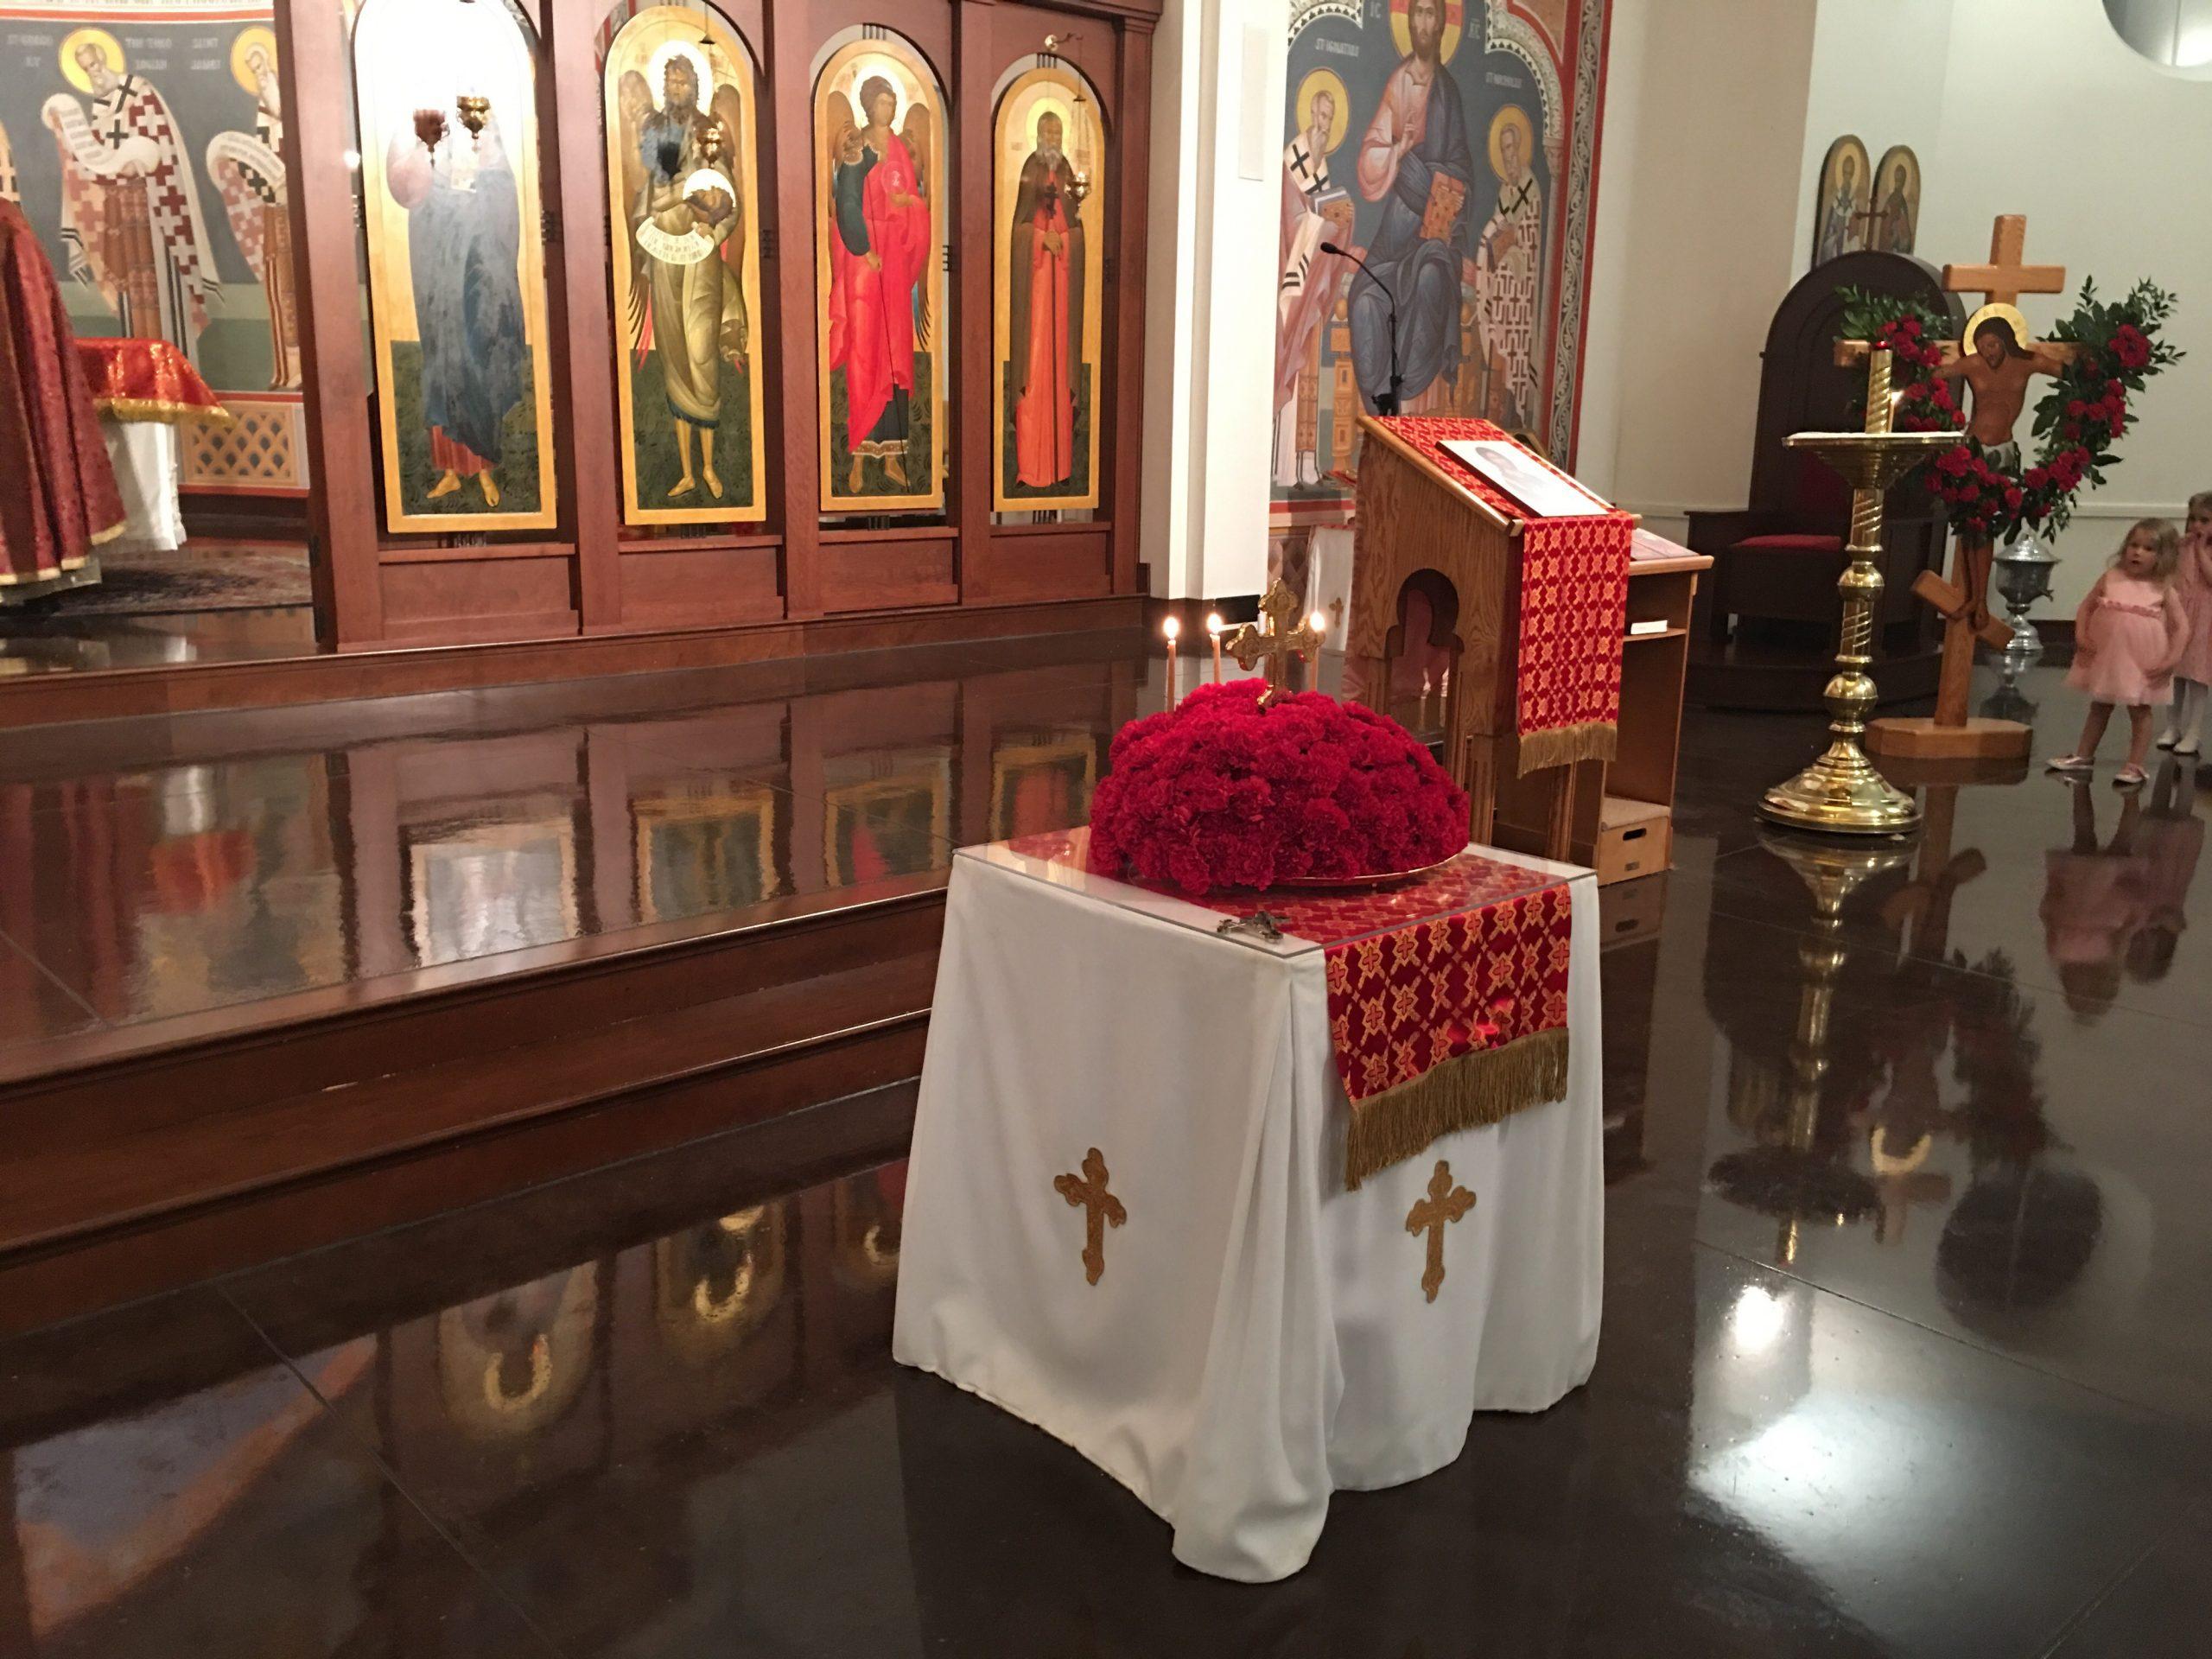 Exhaultation of the Cross 2